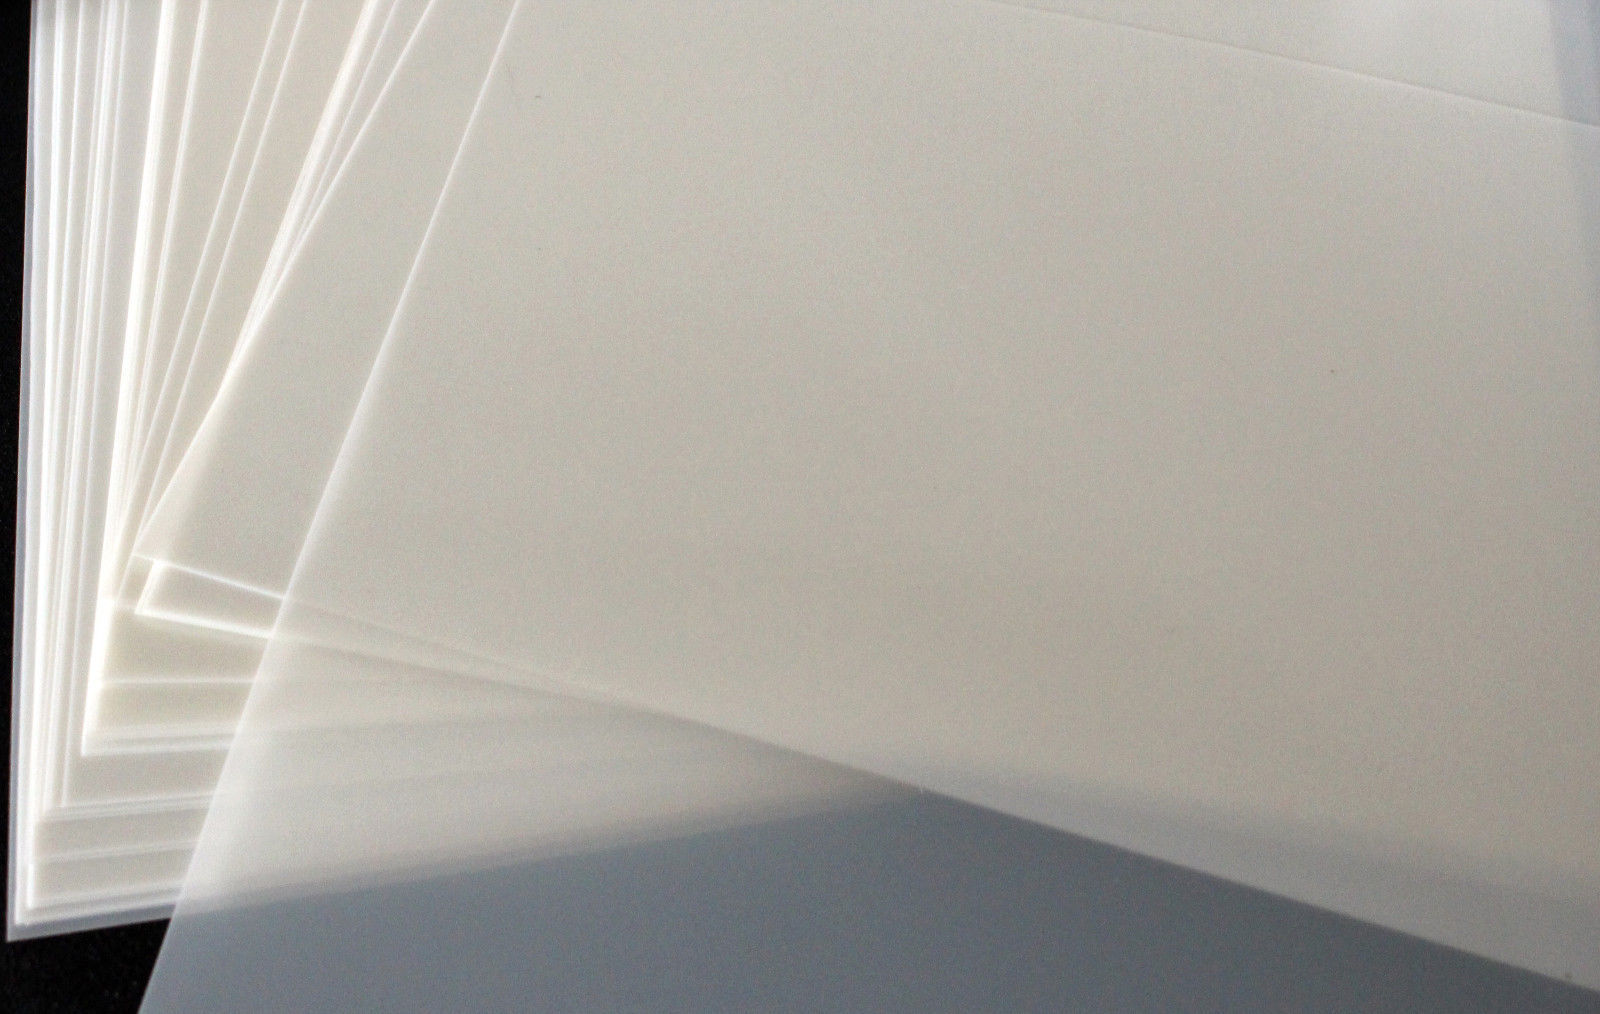 "Blank Mylar Stencil Sheets - 8.5""x11"" 10 Mil OFFICIAL Mylar Stencil Material"